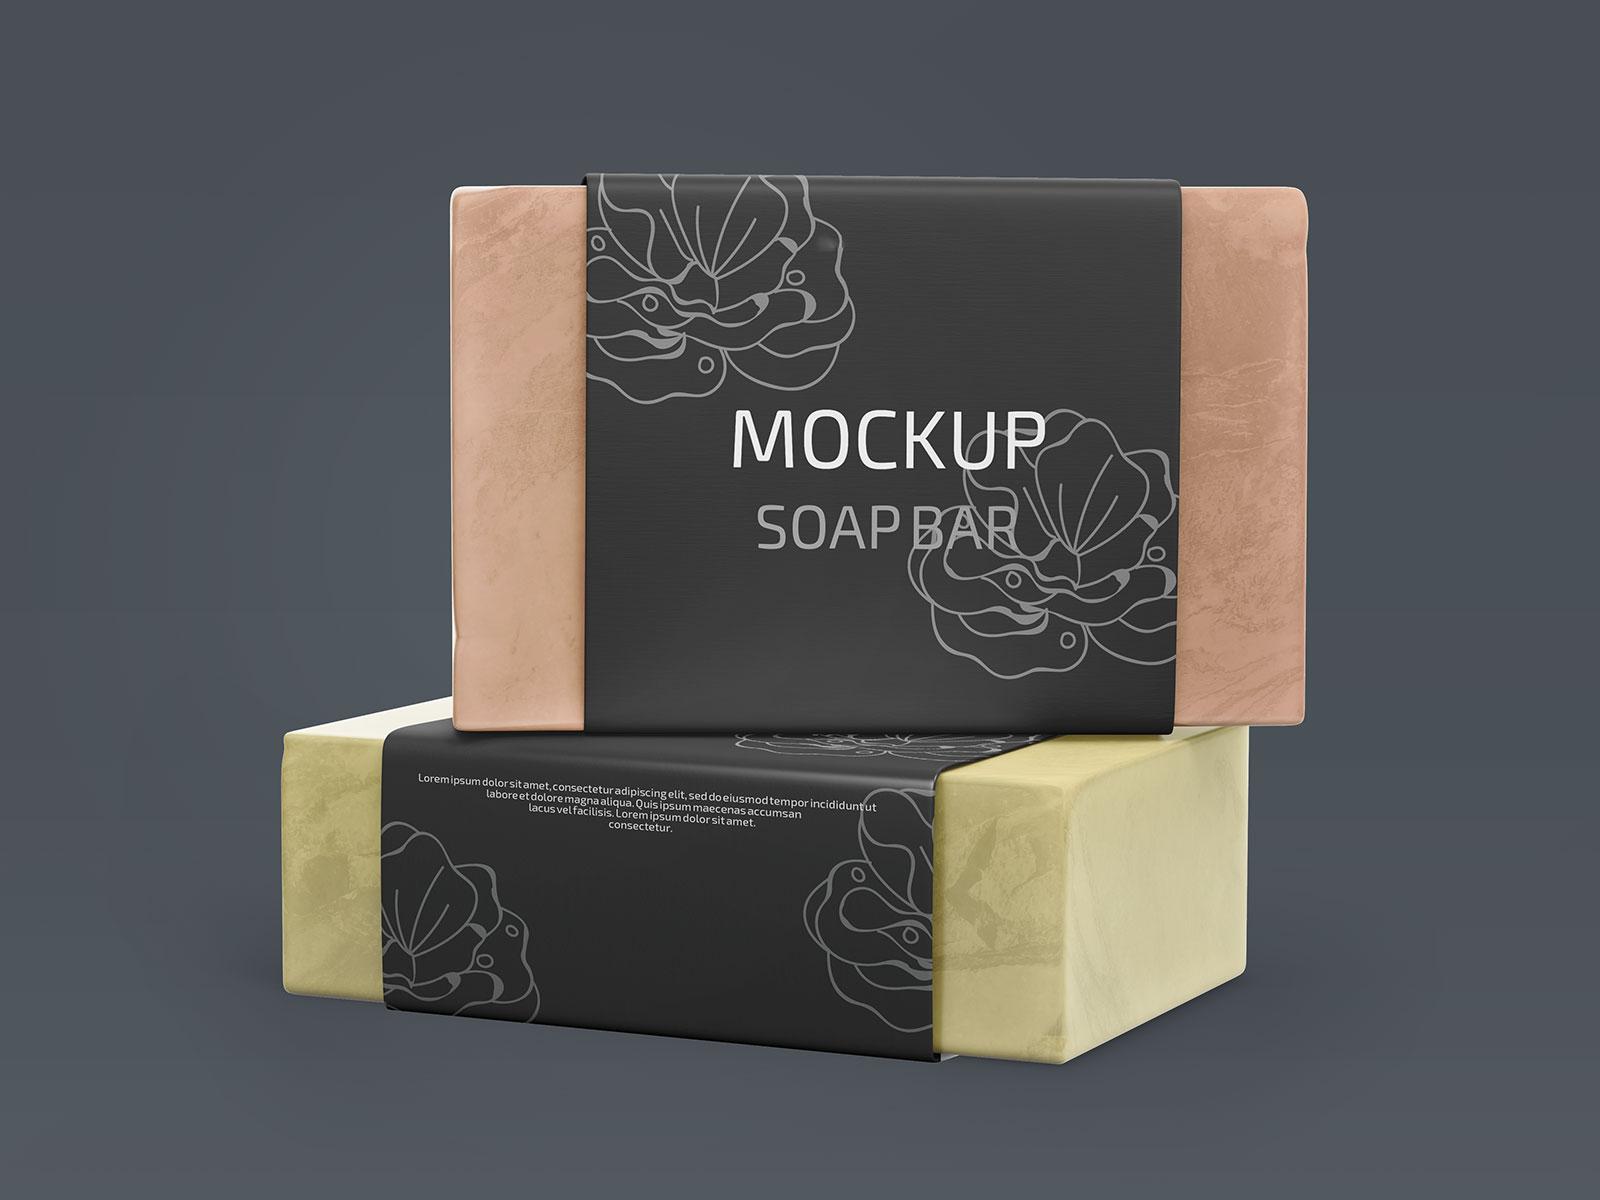 Organic Homemade Soap Wrapper Mockup